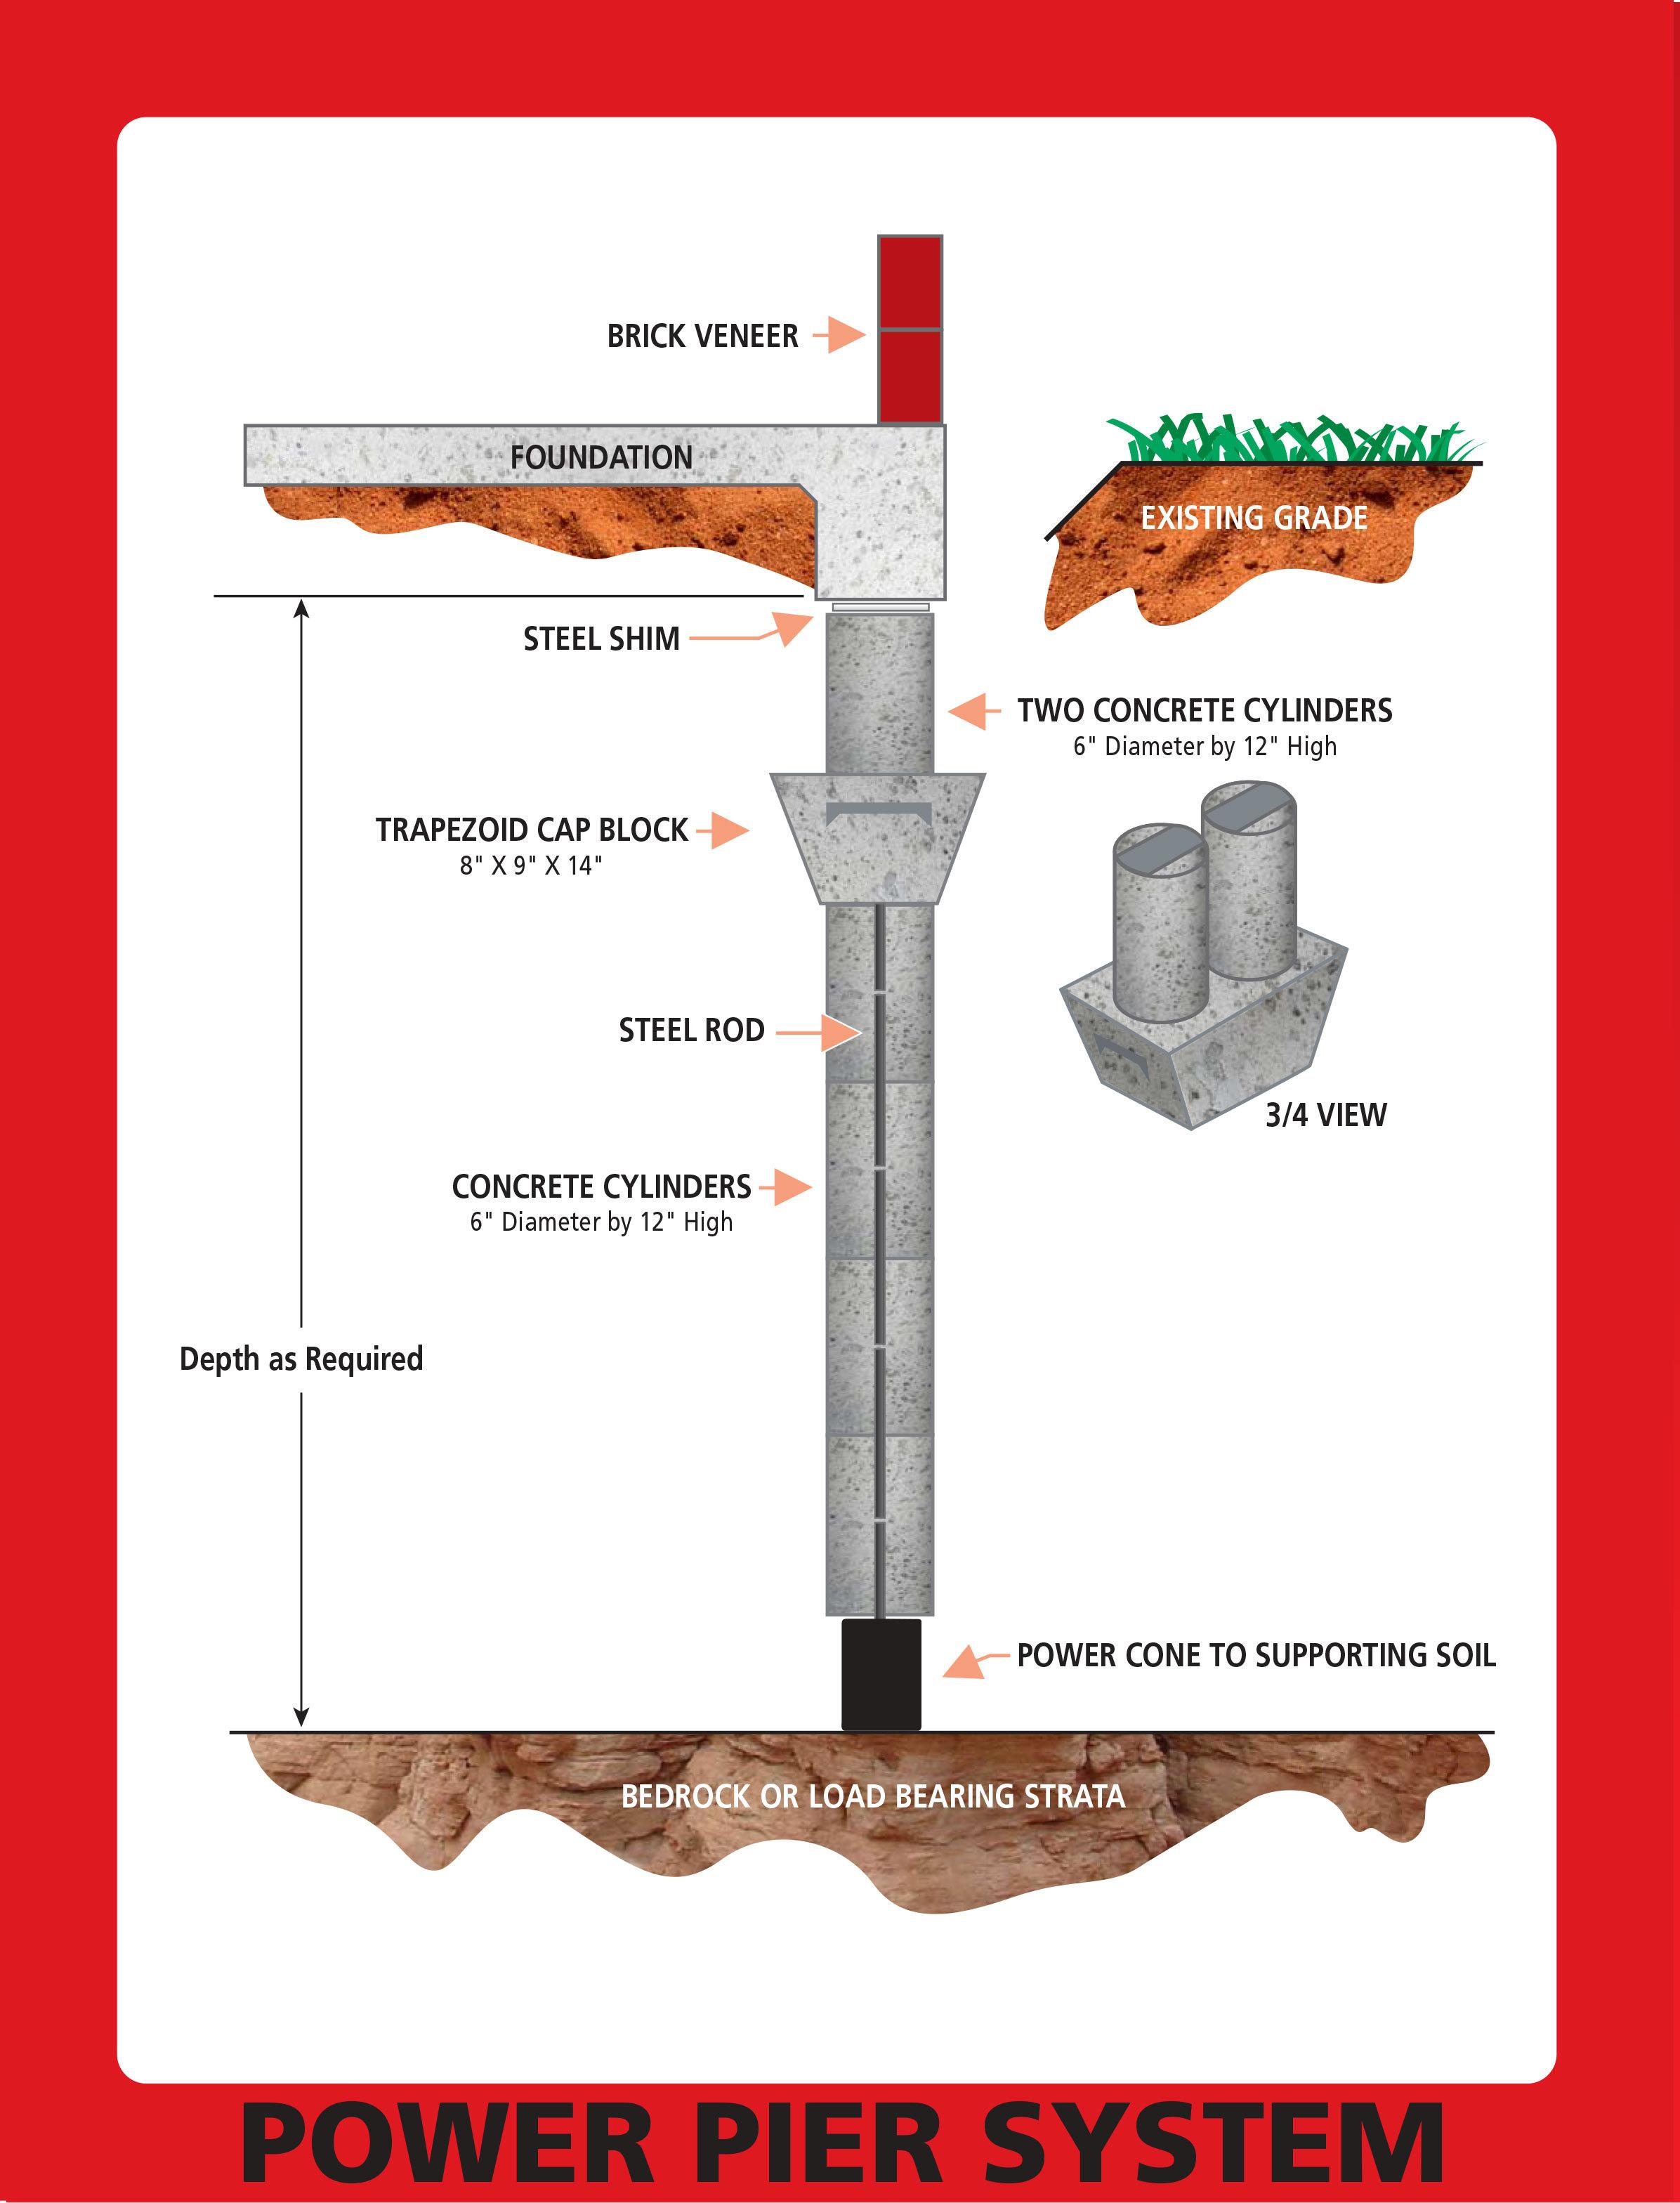 Concrete Piling Repair : Press pile pier north texas foundation repair power